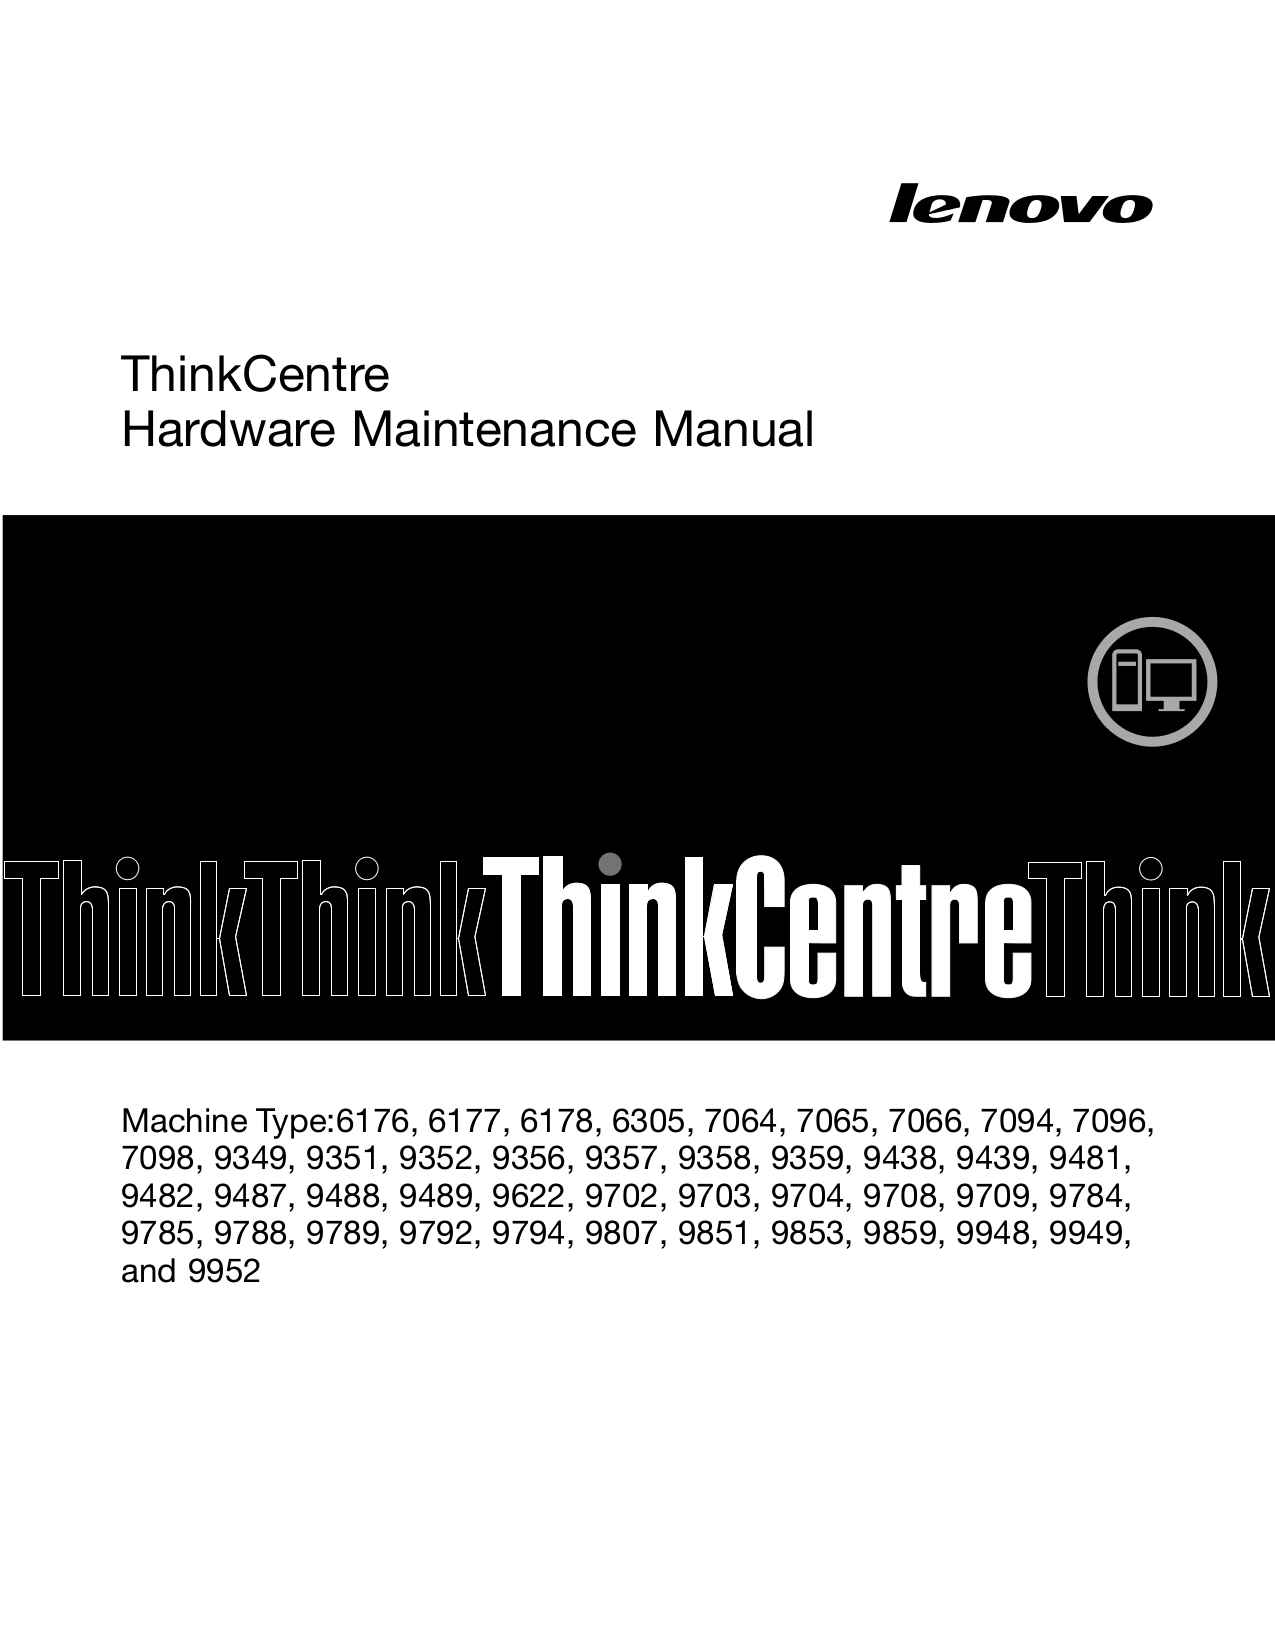 pdf for Lenovo Desktop ThinkCentre M57e 7096 manual